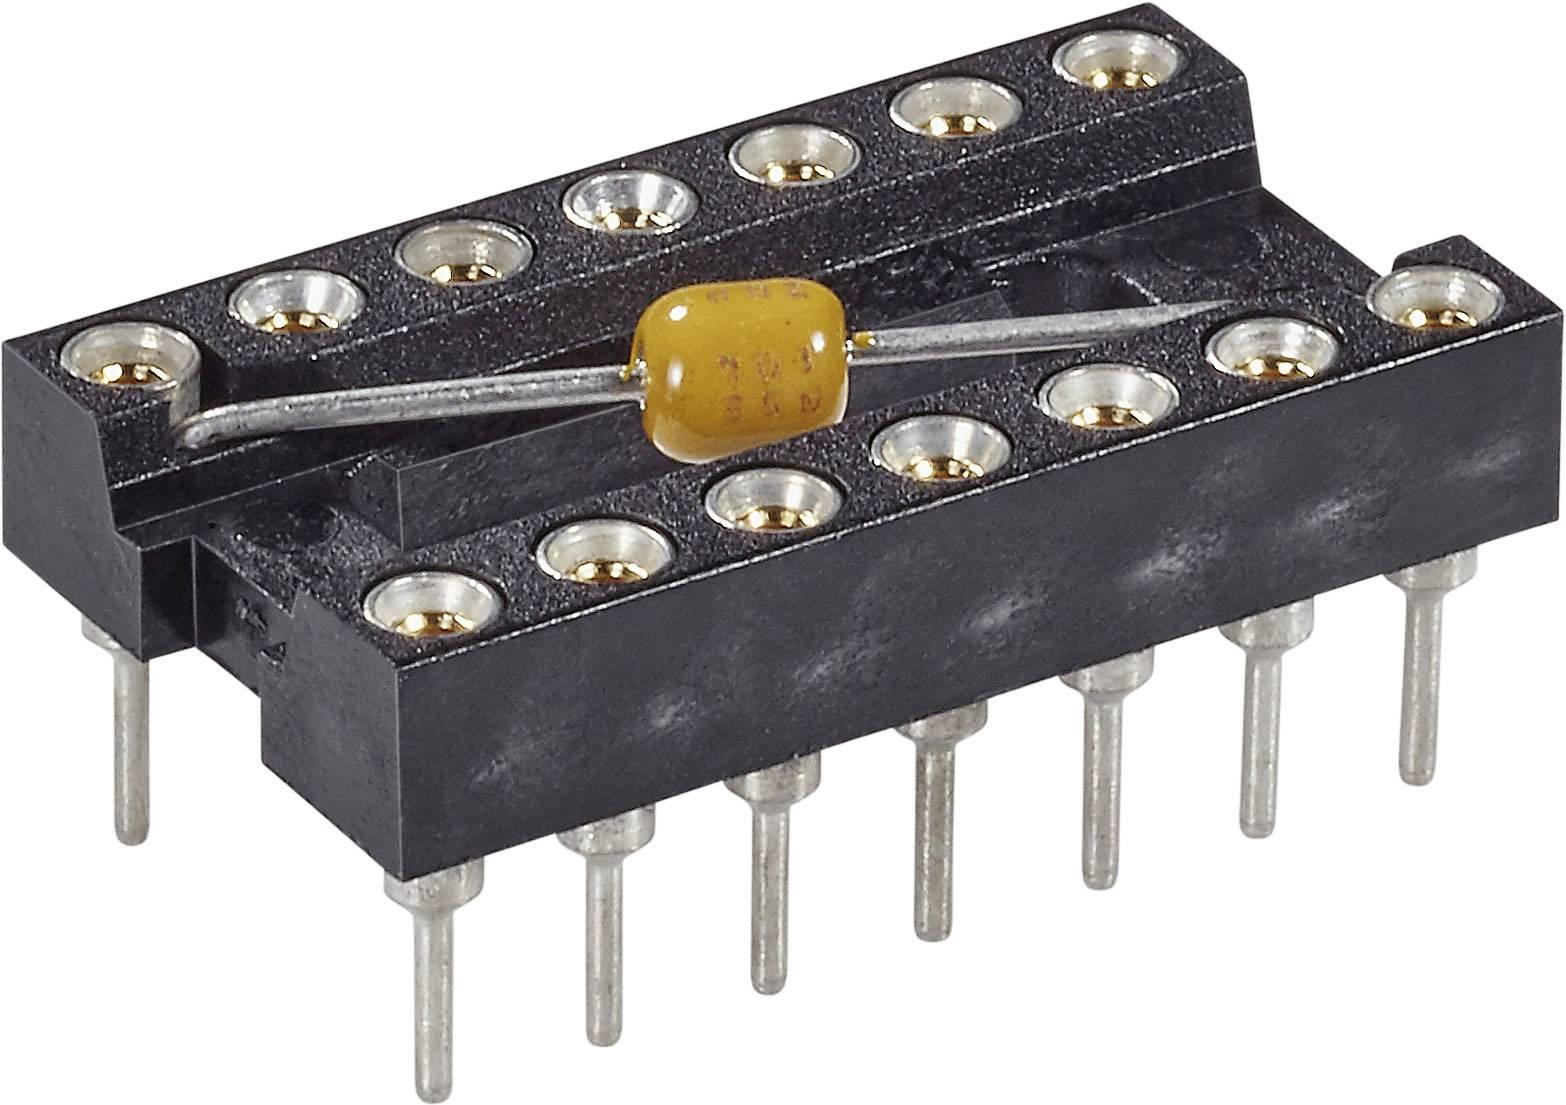 IC pätica MPE Garry MPQ 40.6 STG B 100 nFU presné kontakty, s kondenzátorom, rozteč 15.24 mm, pólů 40, 1 ks